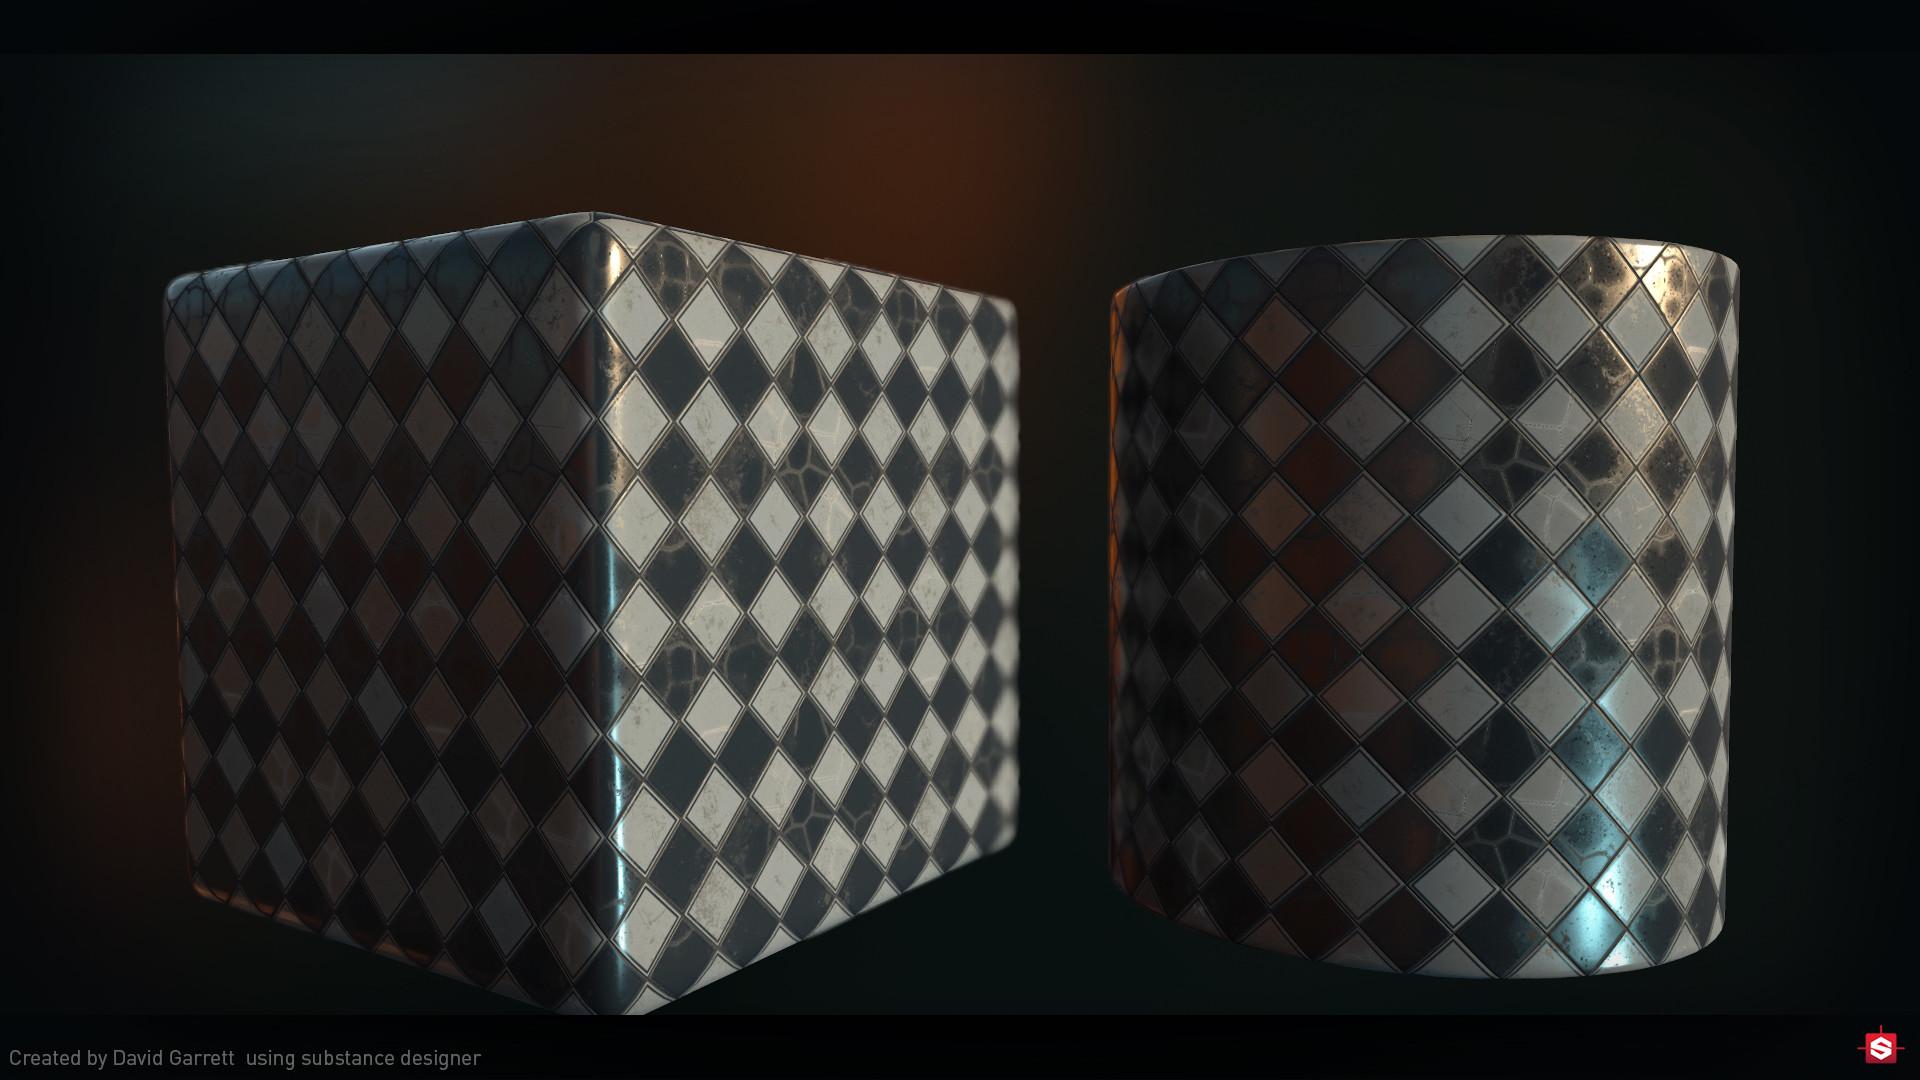 David garrett n3094311 asset shot material tiles